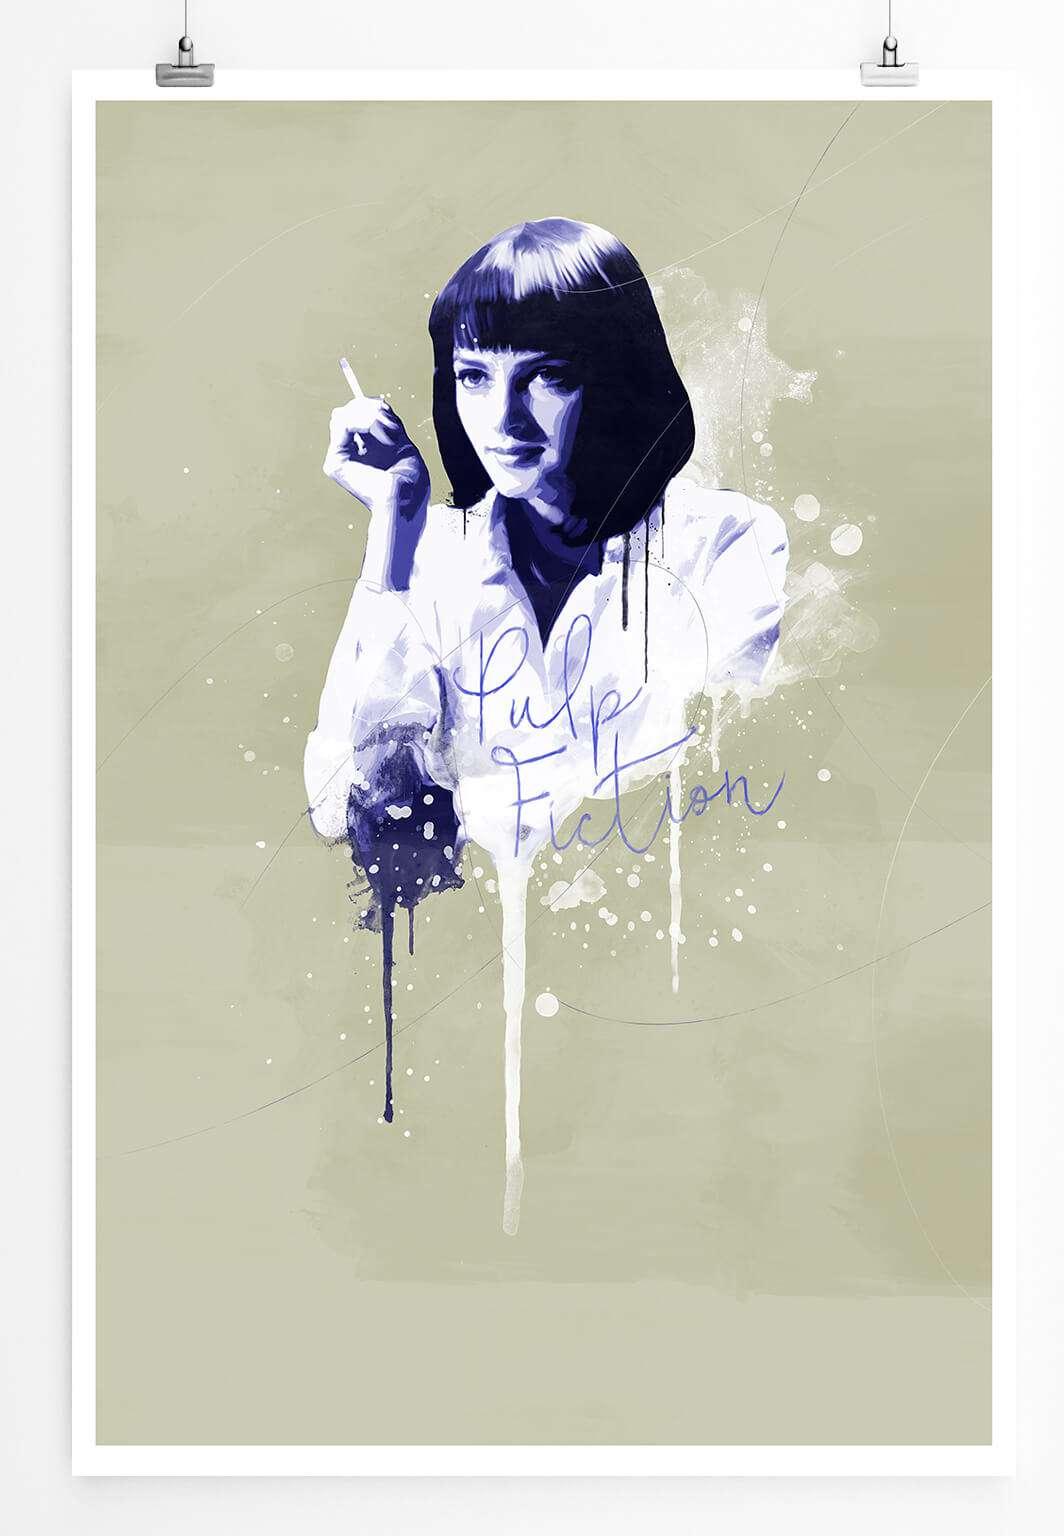 Pulp Fiction Mia Wallace 90x60cm Paul Sinus Art Splash Art Wandbild